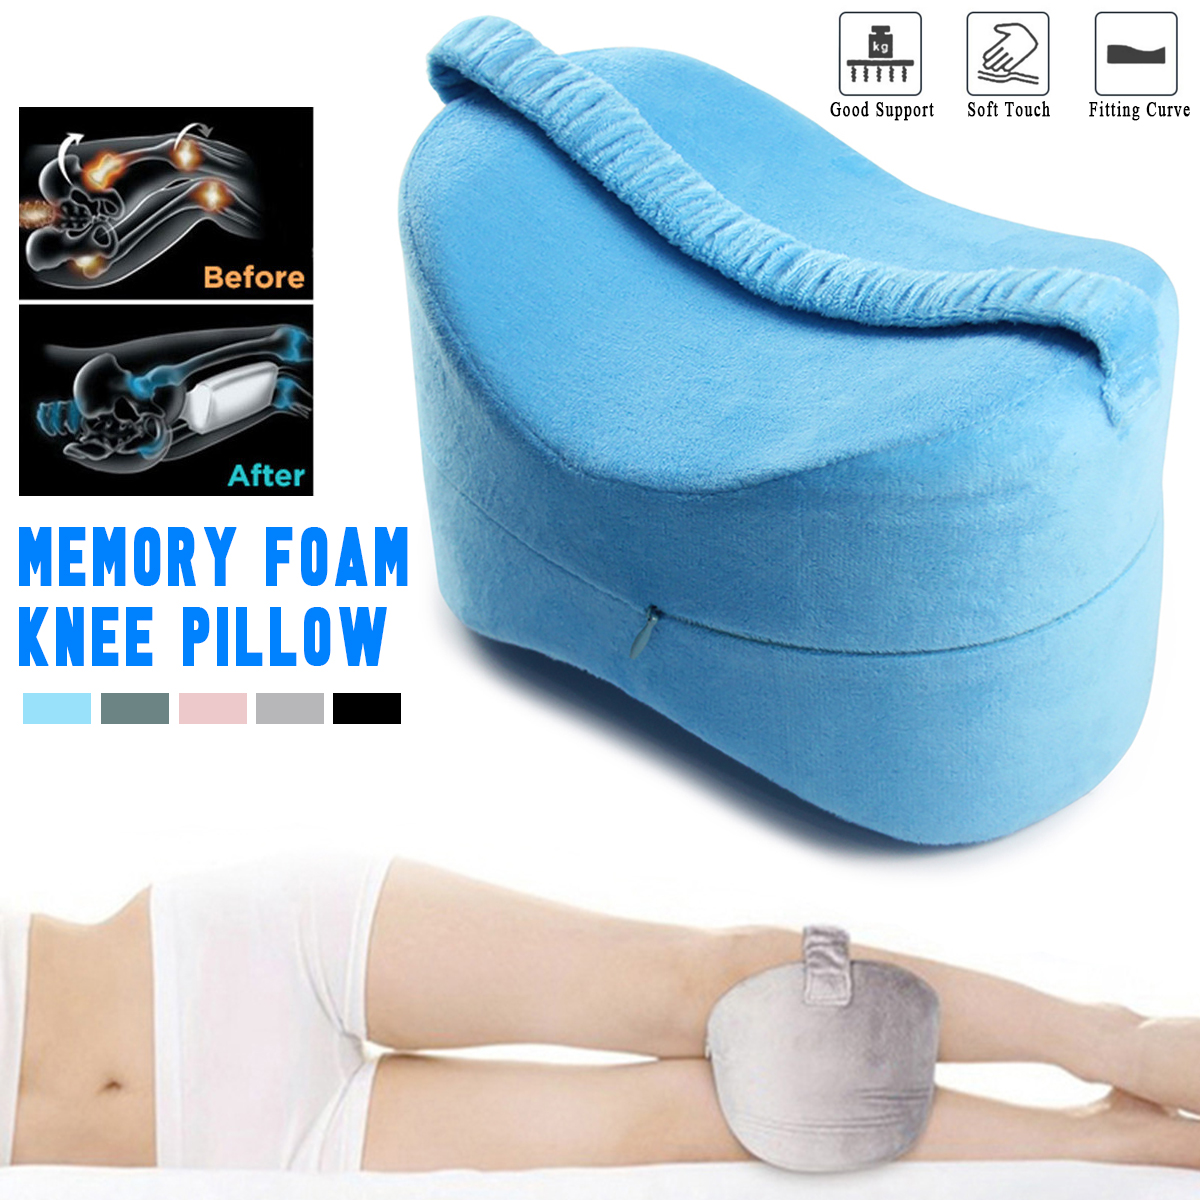 Knee Pillow Leg Pillow Memory Foam for Sleeping Support Cushion Side Sleepers